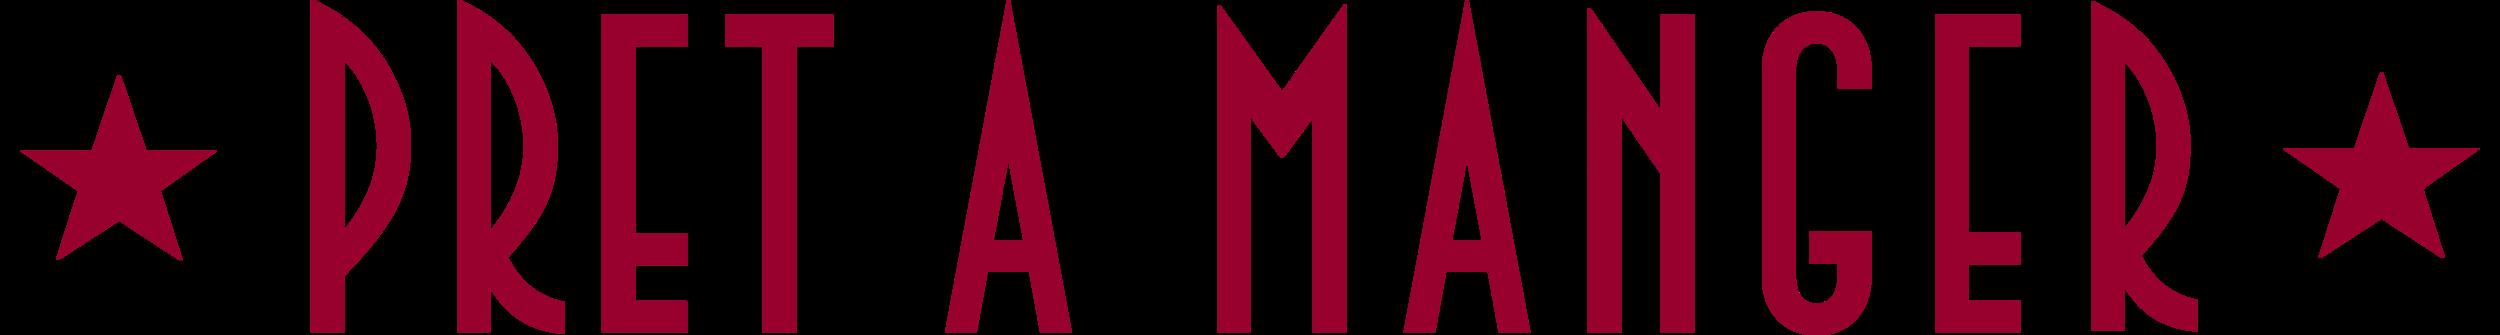 Pret_a_Manger_logotype.png